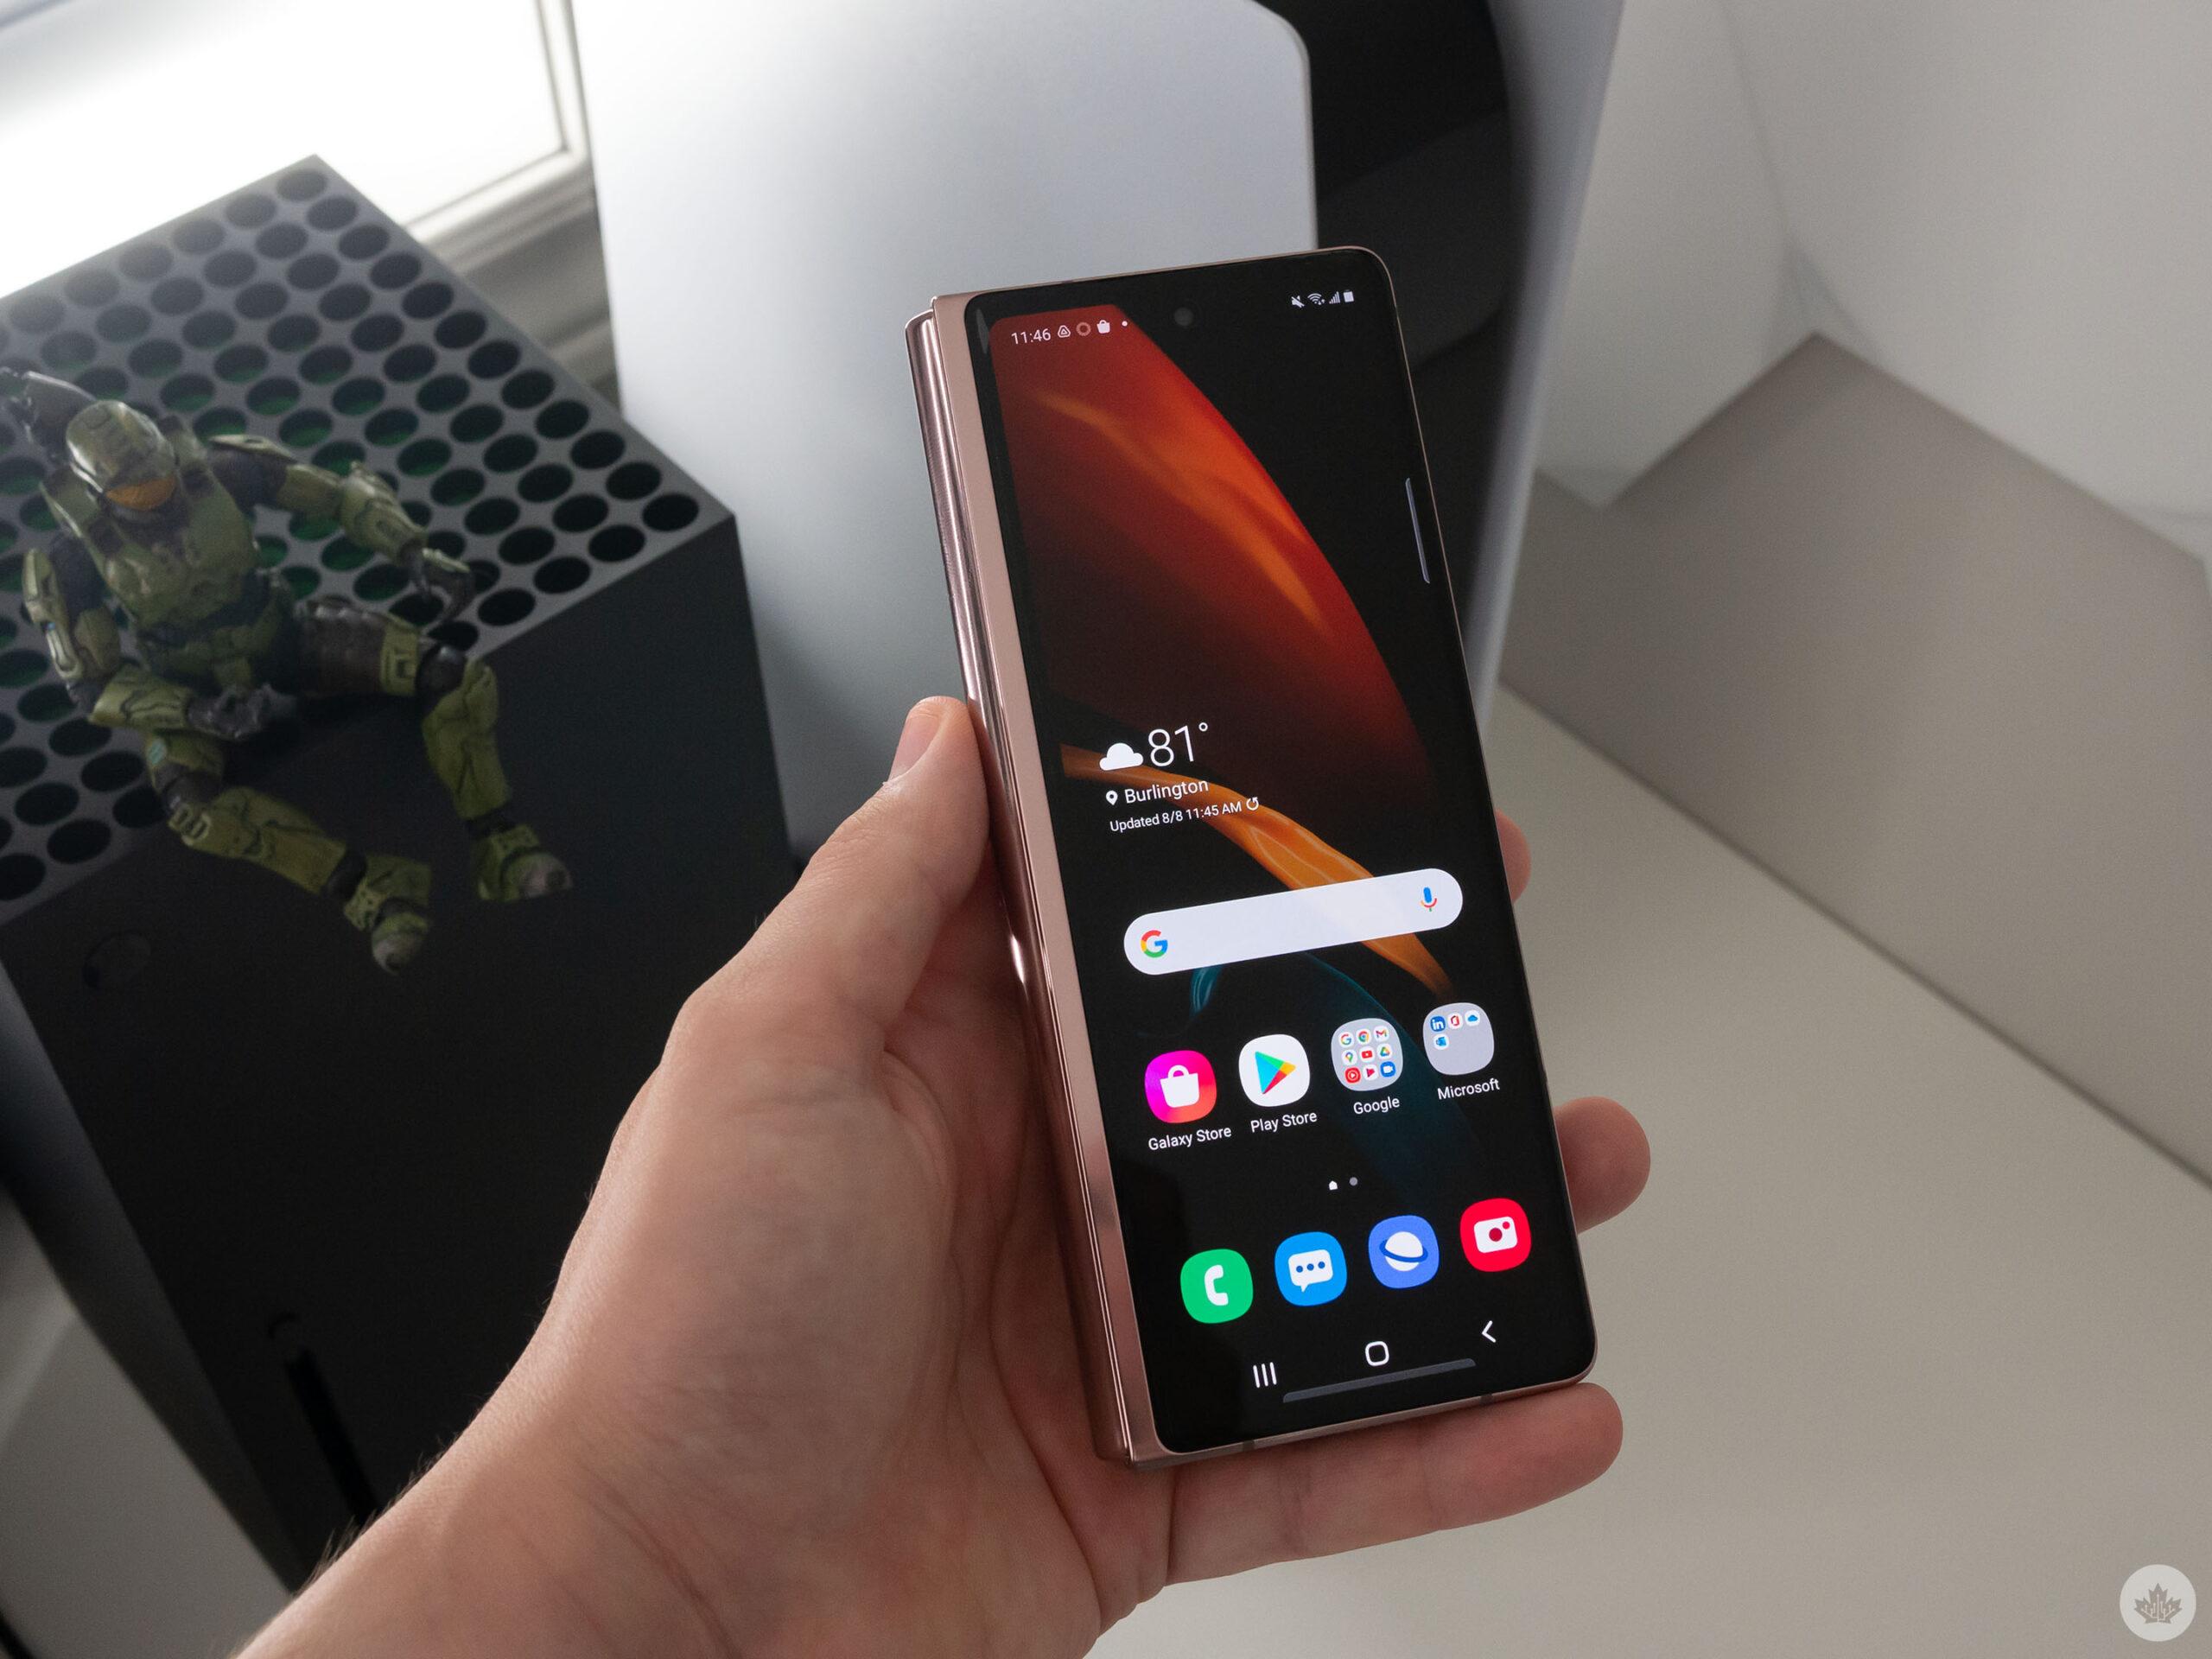 Galaxy Fold 2 front display